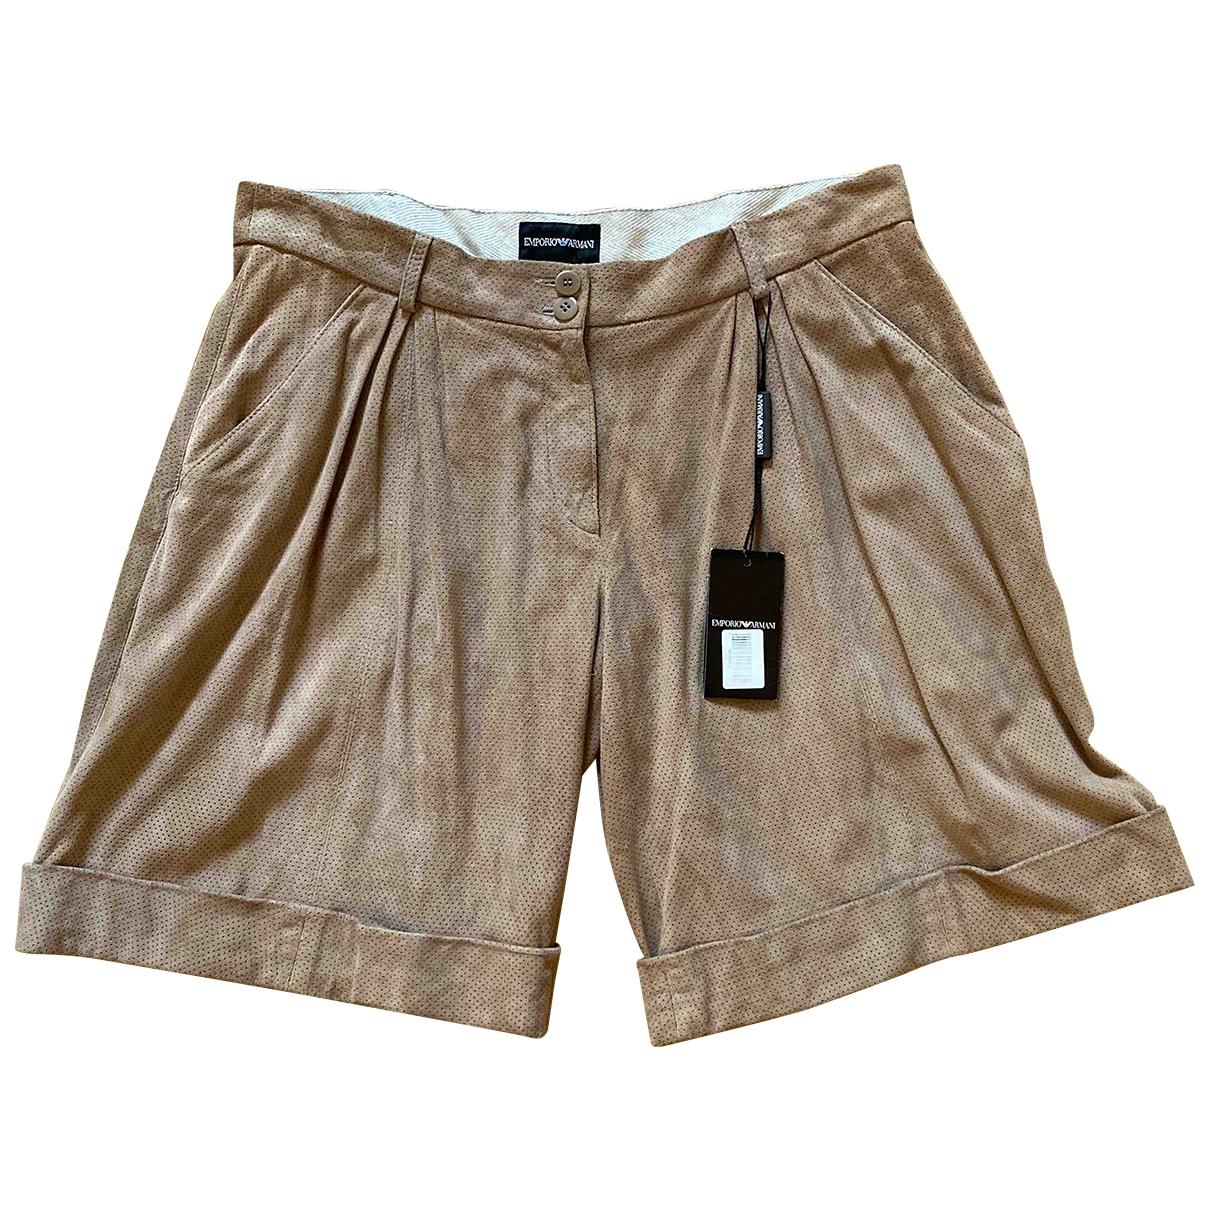 Emporio Armani \N Shorts in  Beige Veloursleder